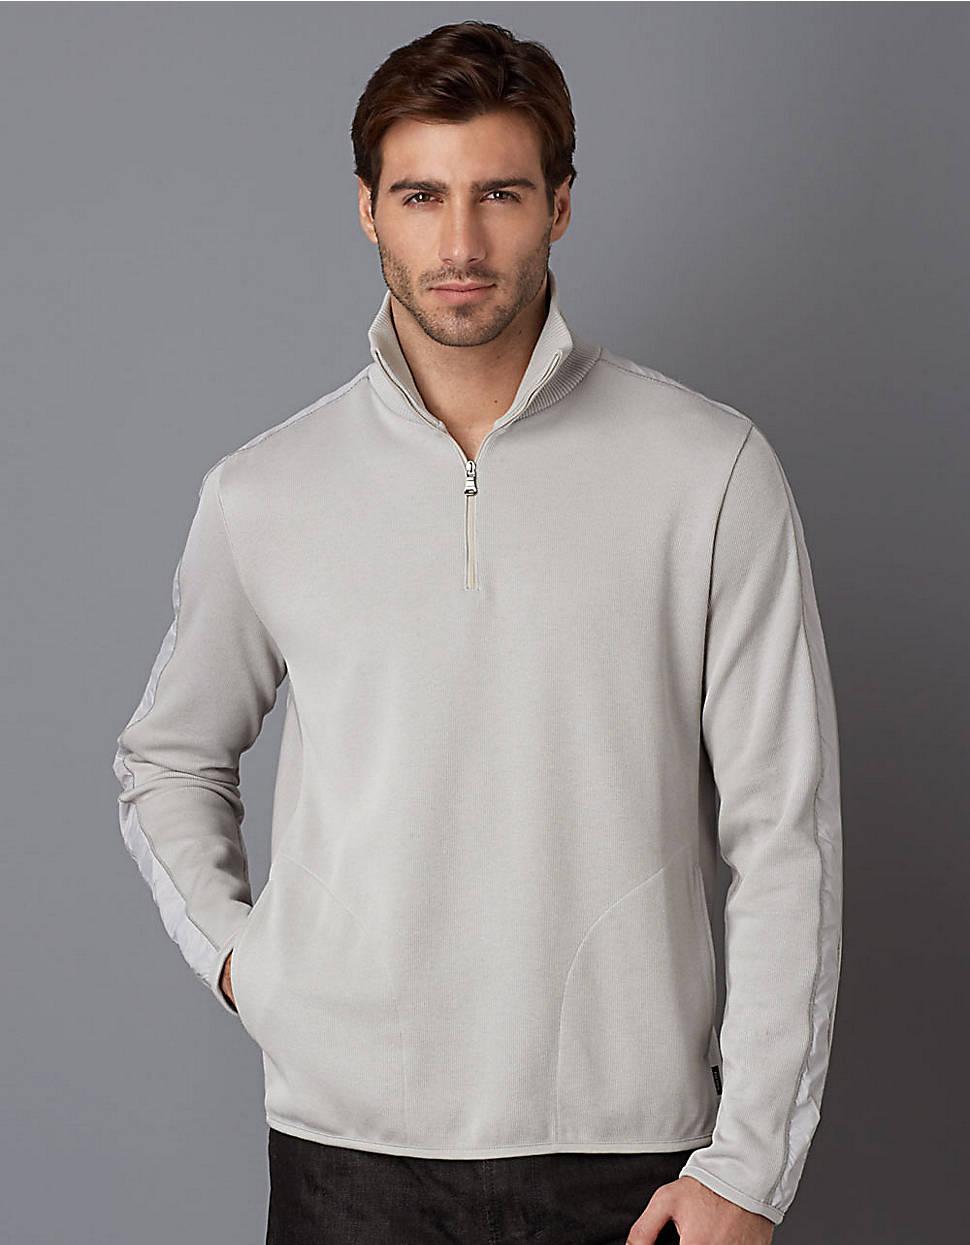 hugo boss 14zip pullover fleece in gray for men grey lyst. Black Bedroom Furniture Sets. Home Design Ideas